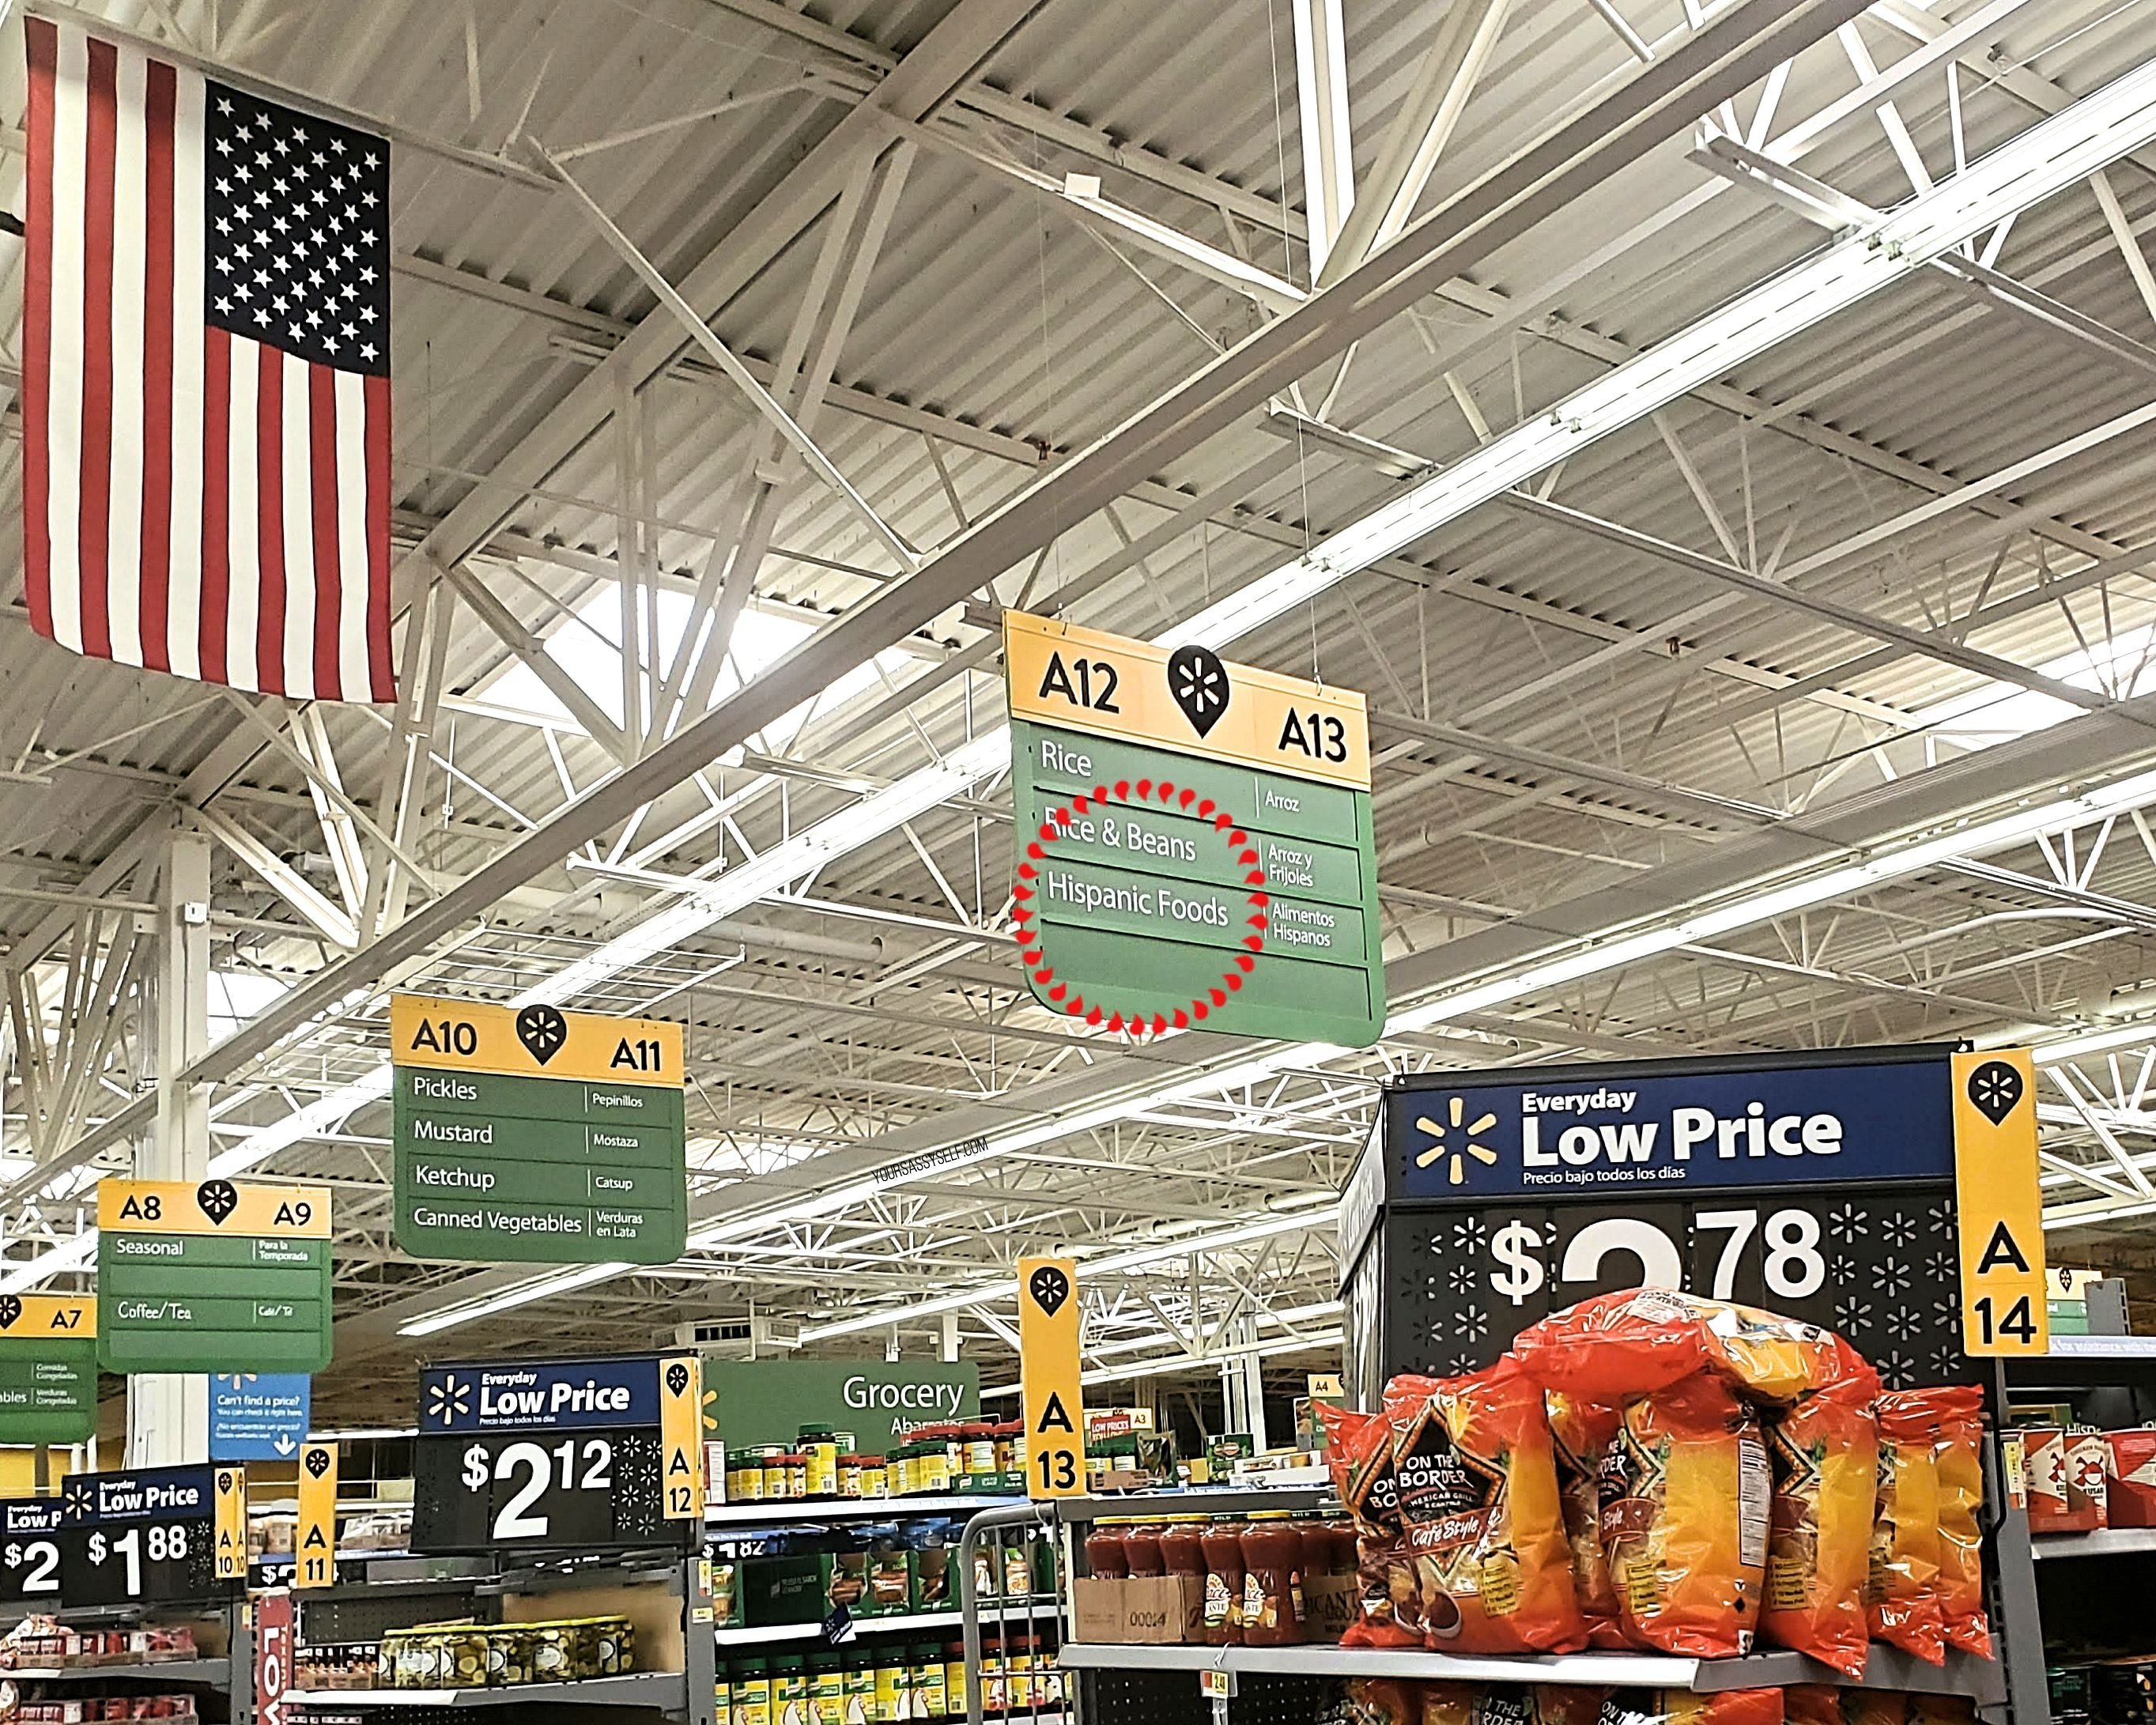 Hispanic Foods aisle at Walmart - yoursassyself.com